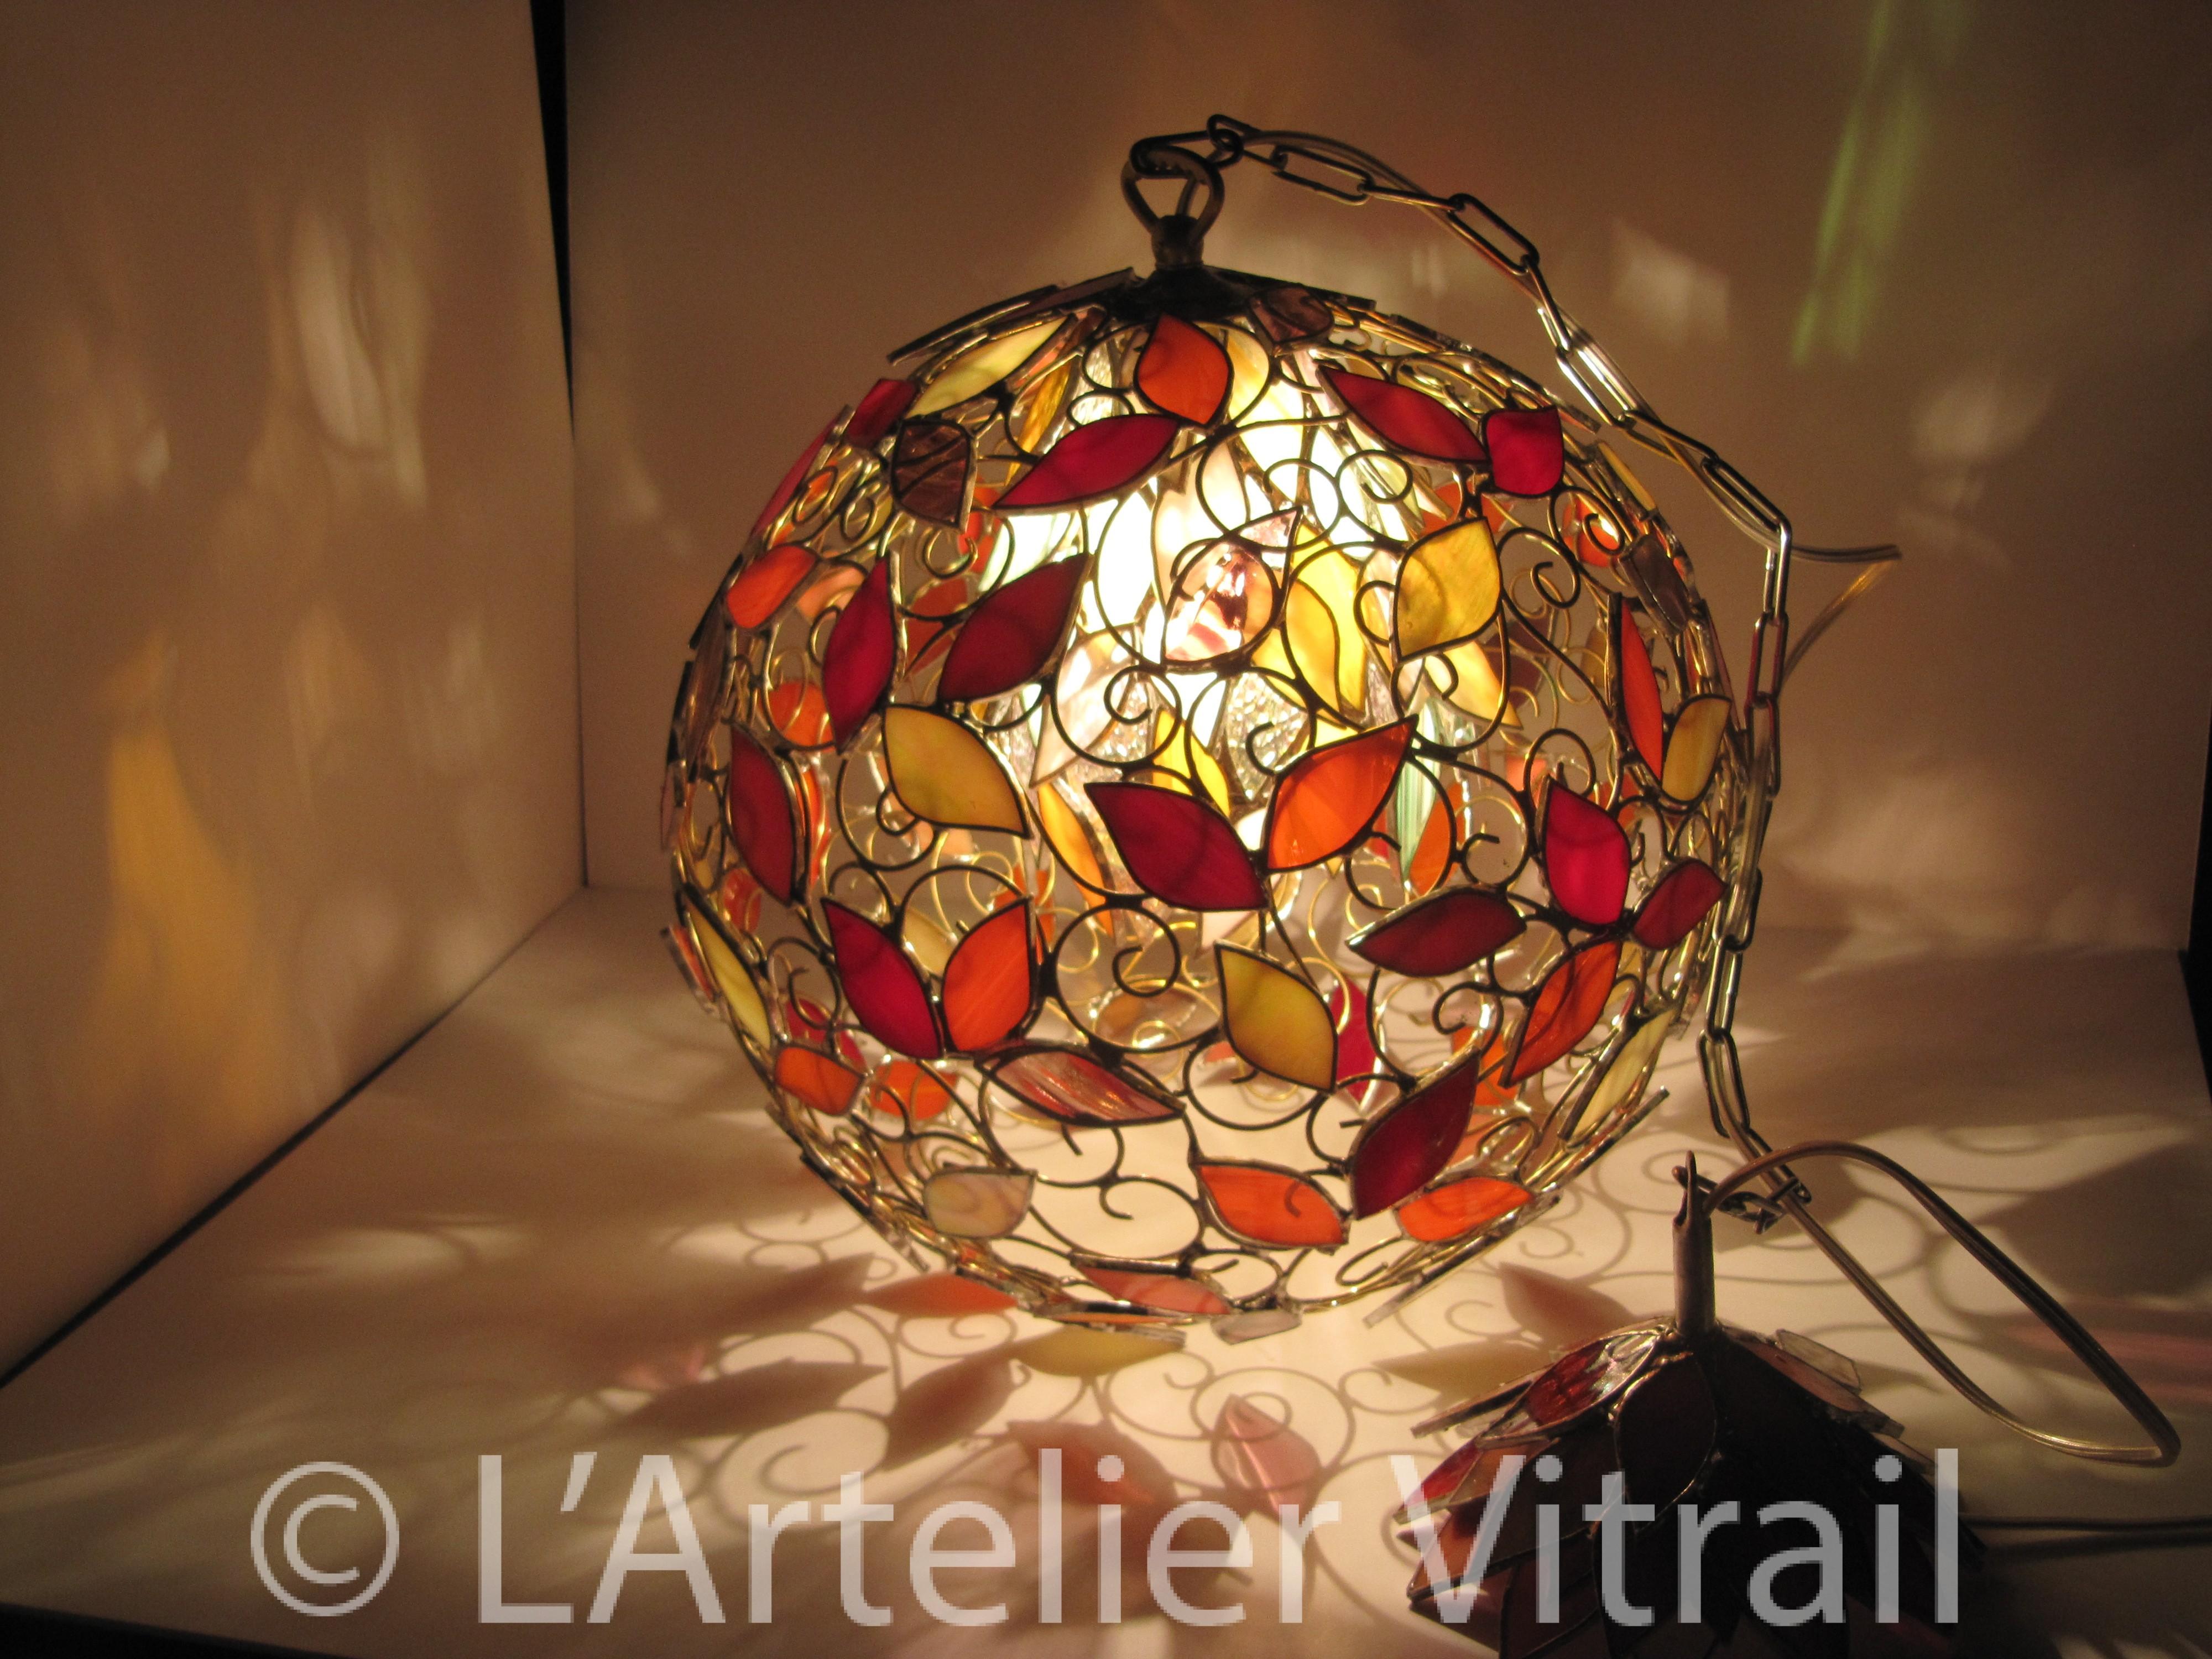 D coration l 39 art elier vitraill 39 art elier vitrail for Vitrail decoration